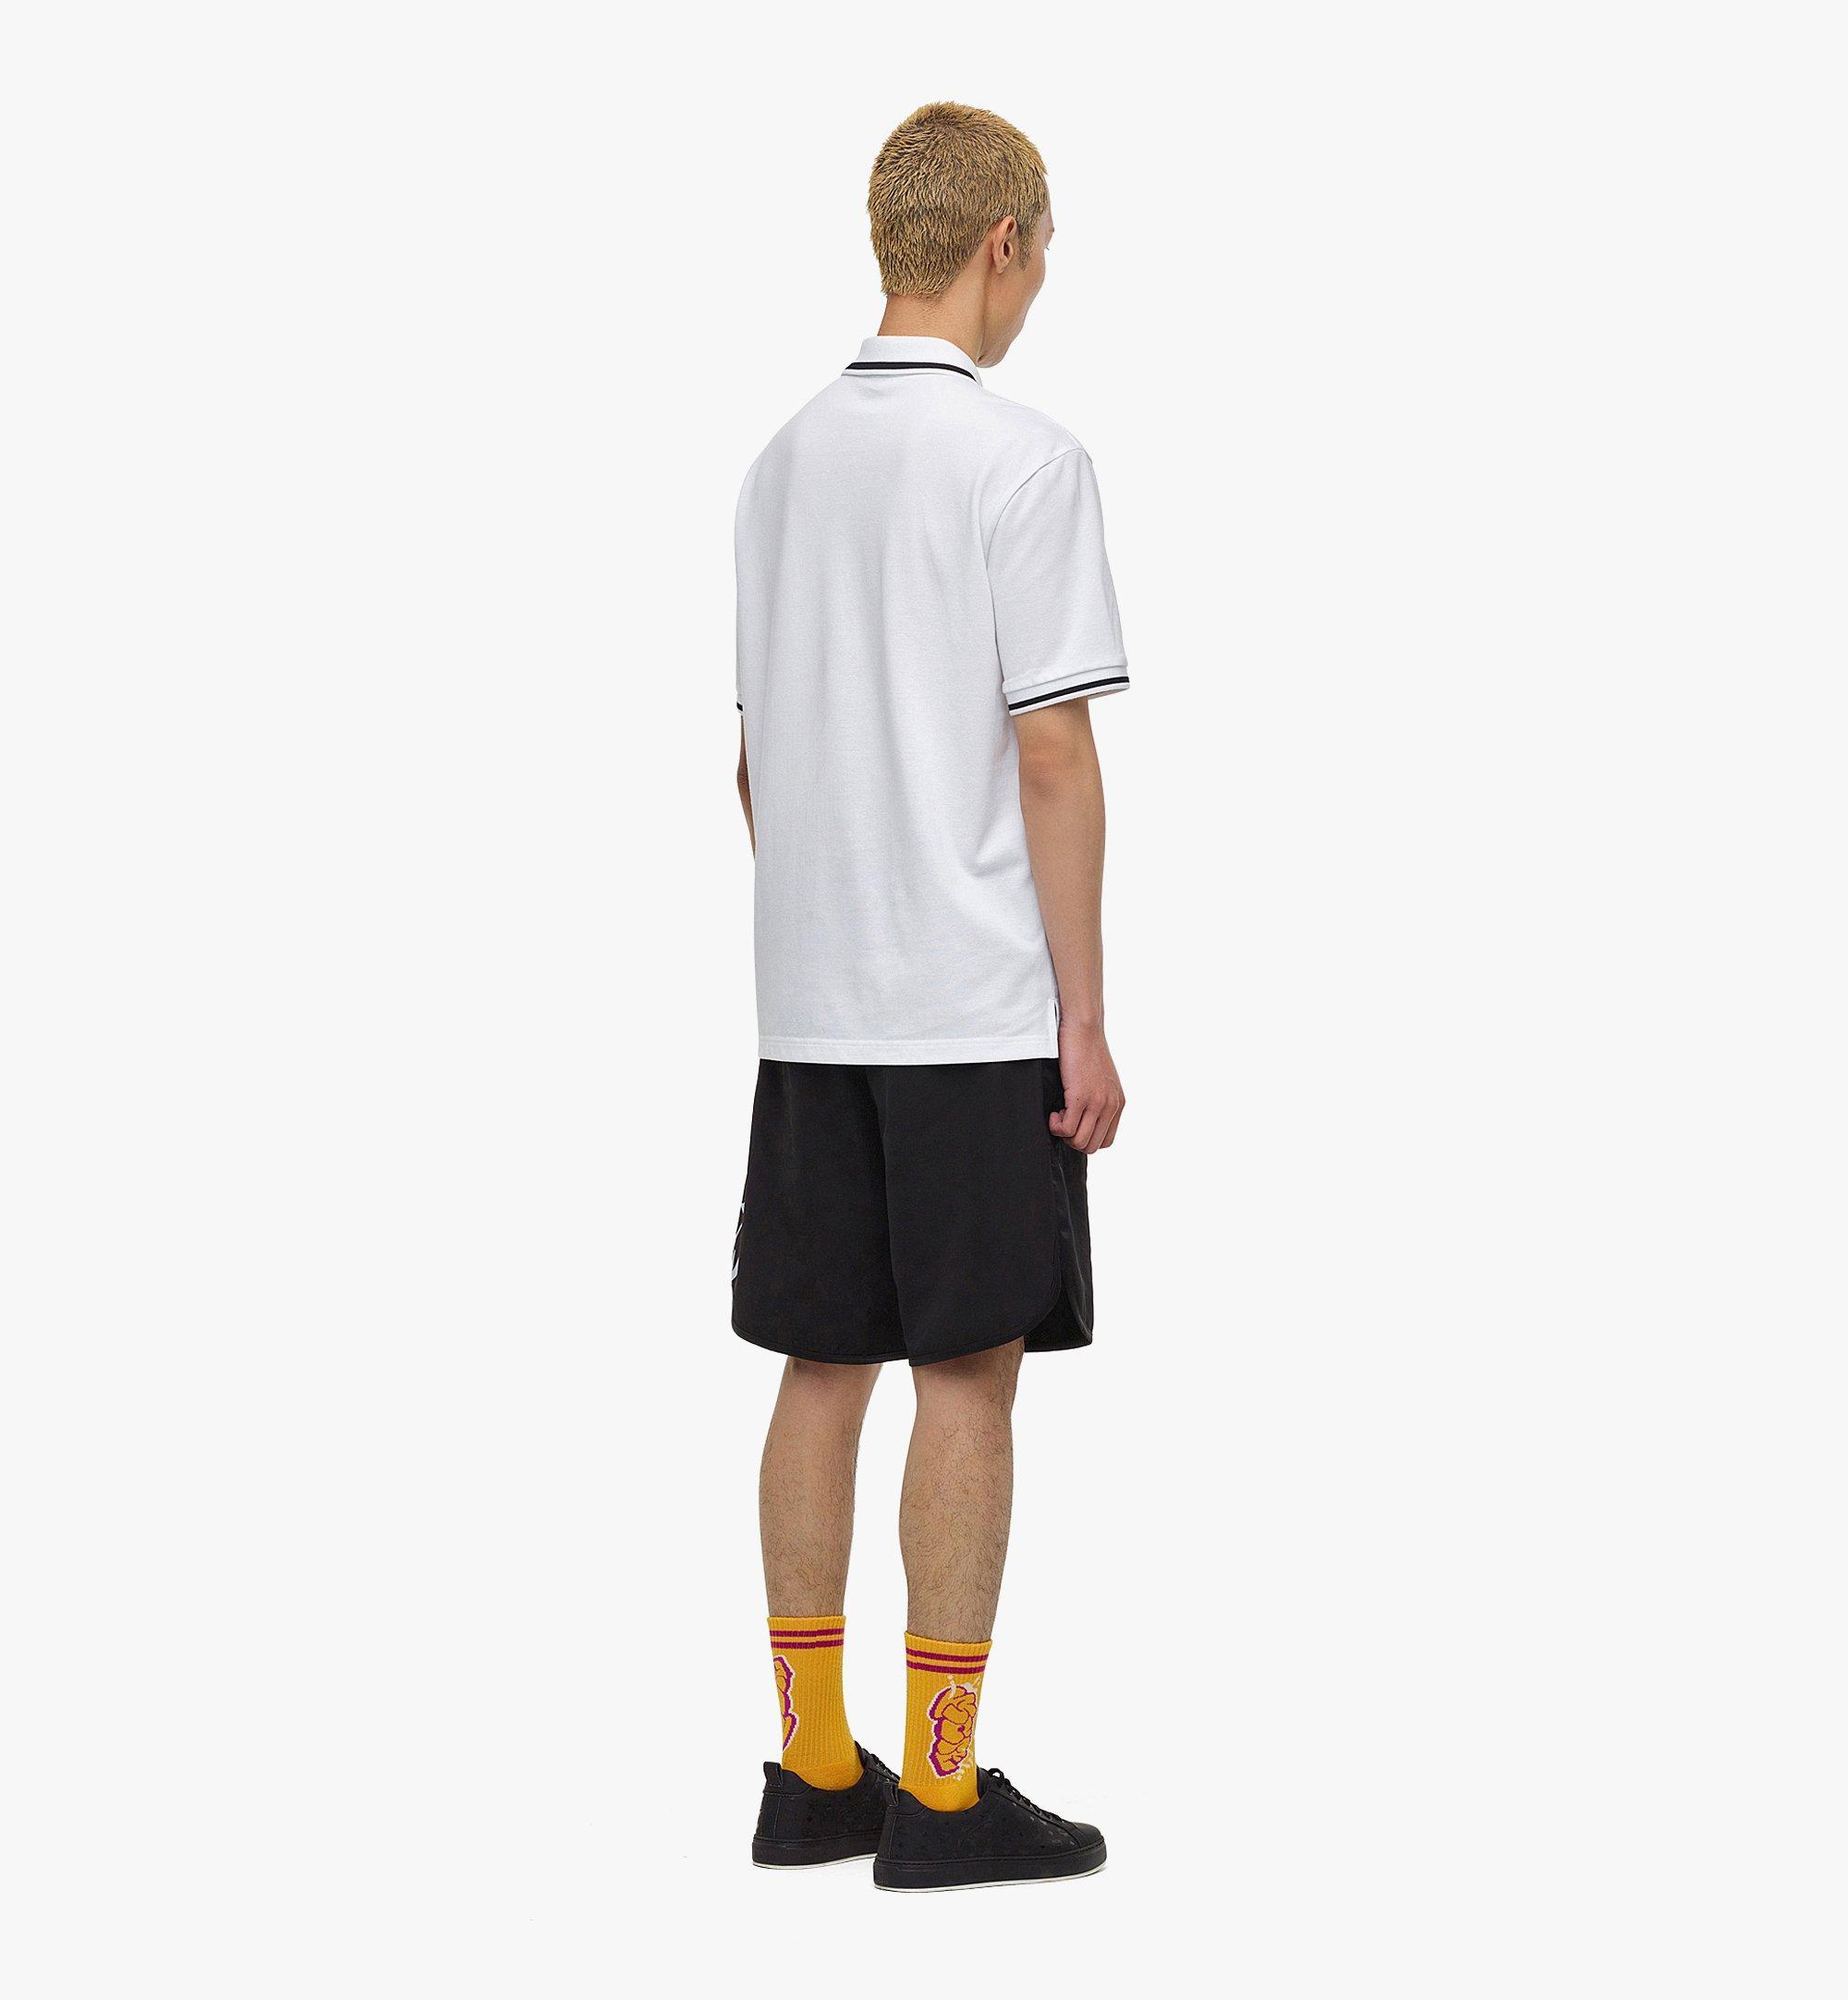 MCM เสื้อโปโล MCM x SAMBYPEN สำหรับผู้ชาย White MHTBASP01WT00L มุมมองอื่น 2